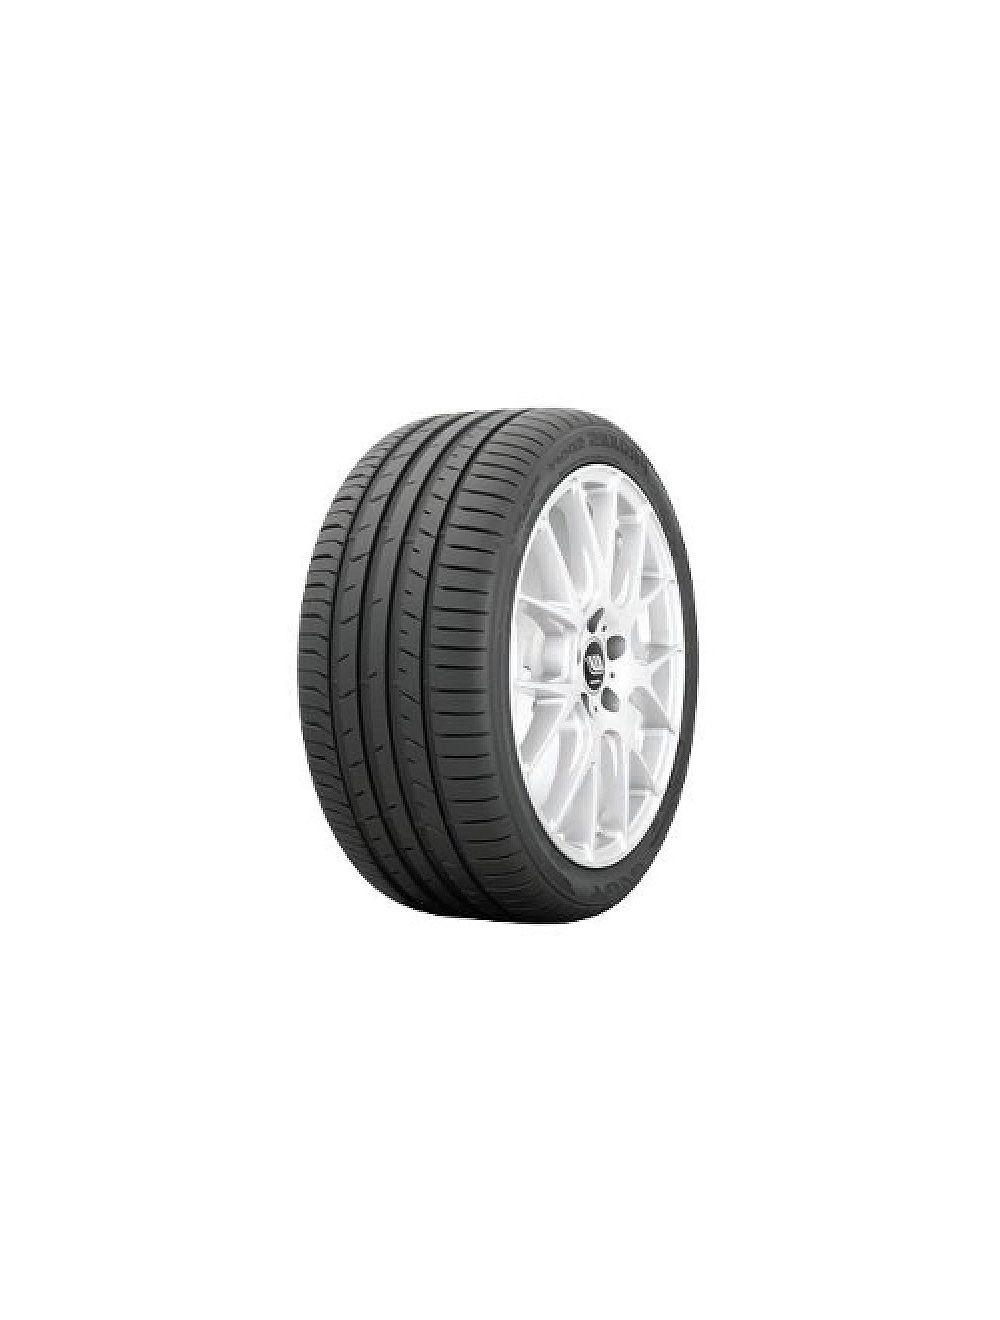 Toyo 285/30R19 Y Proxes Sport XL Nyári gumi